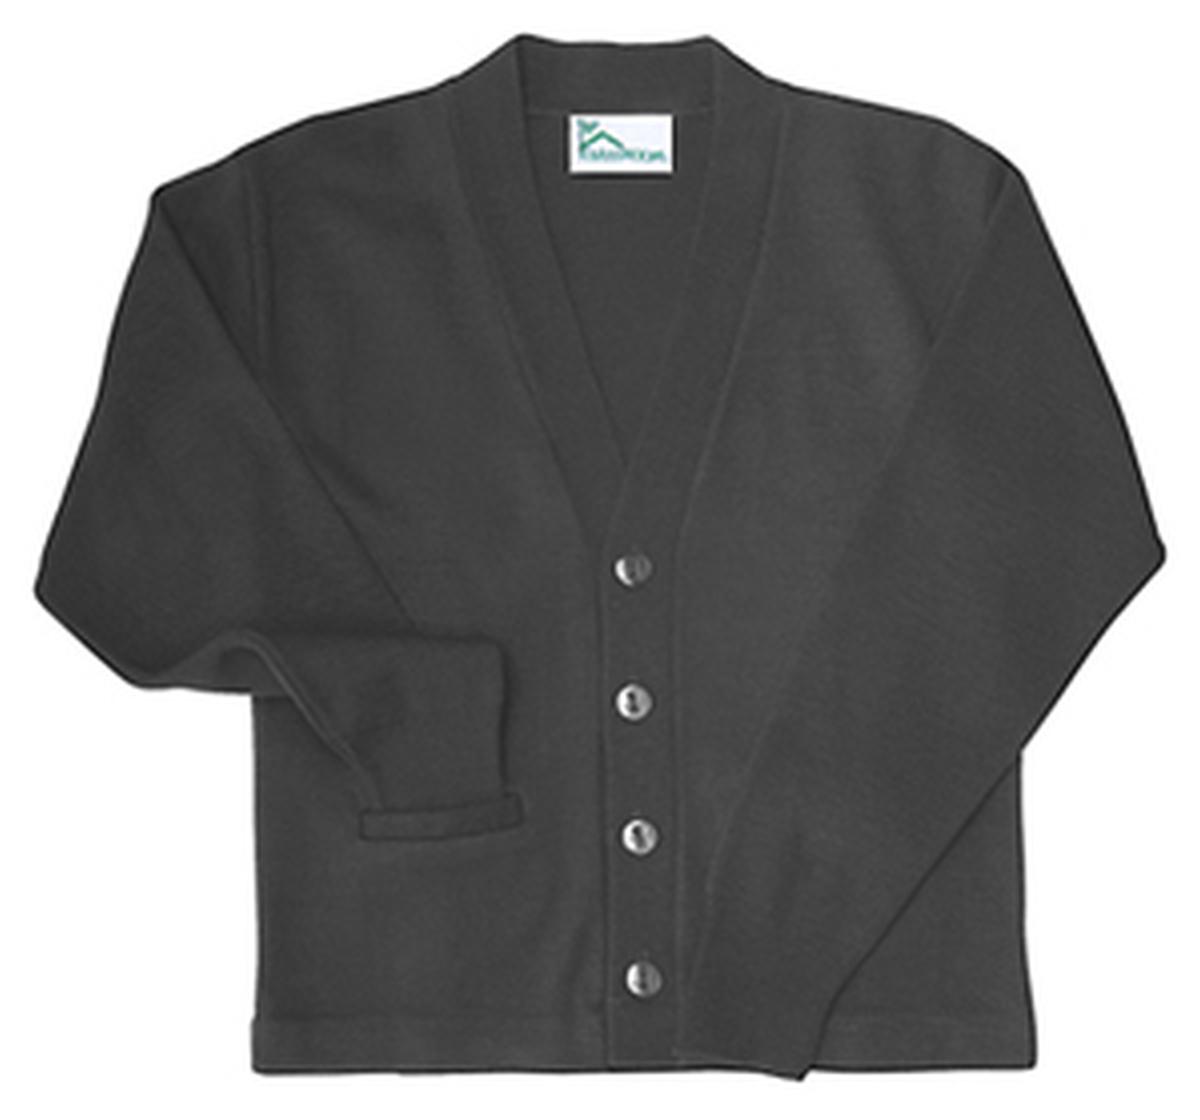 Buy Youth Unisex Cardigan Sweater - Classroom School Uniforms Online ... 026e4ea35